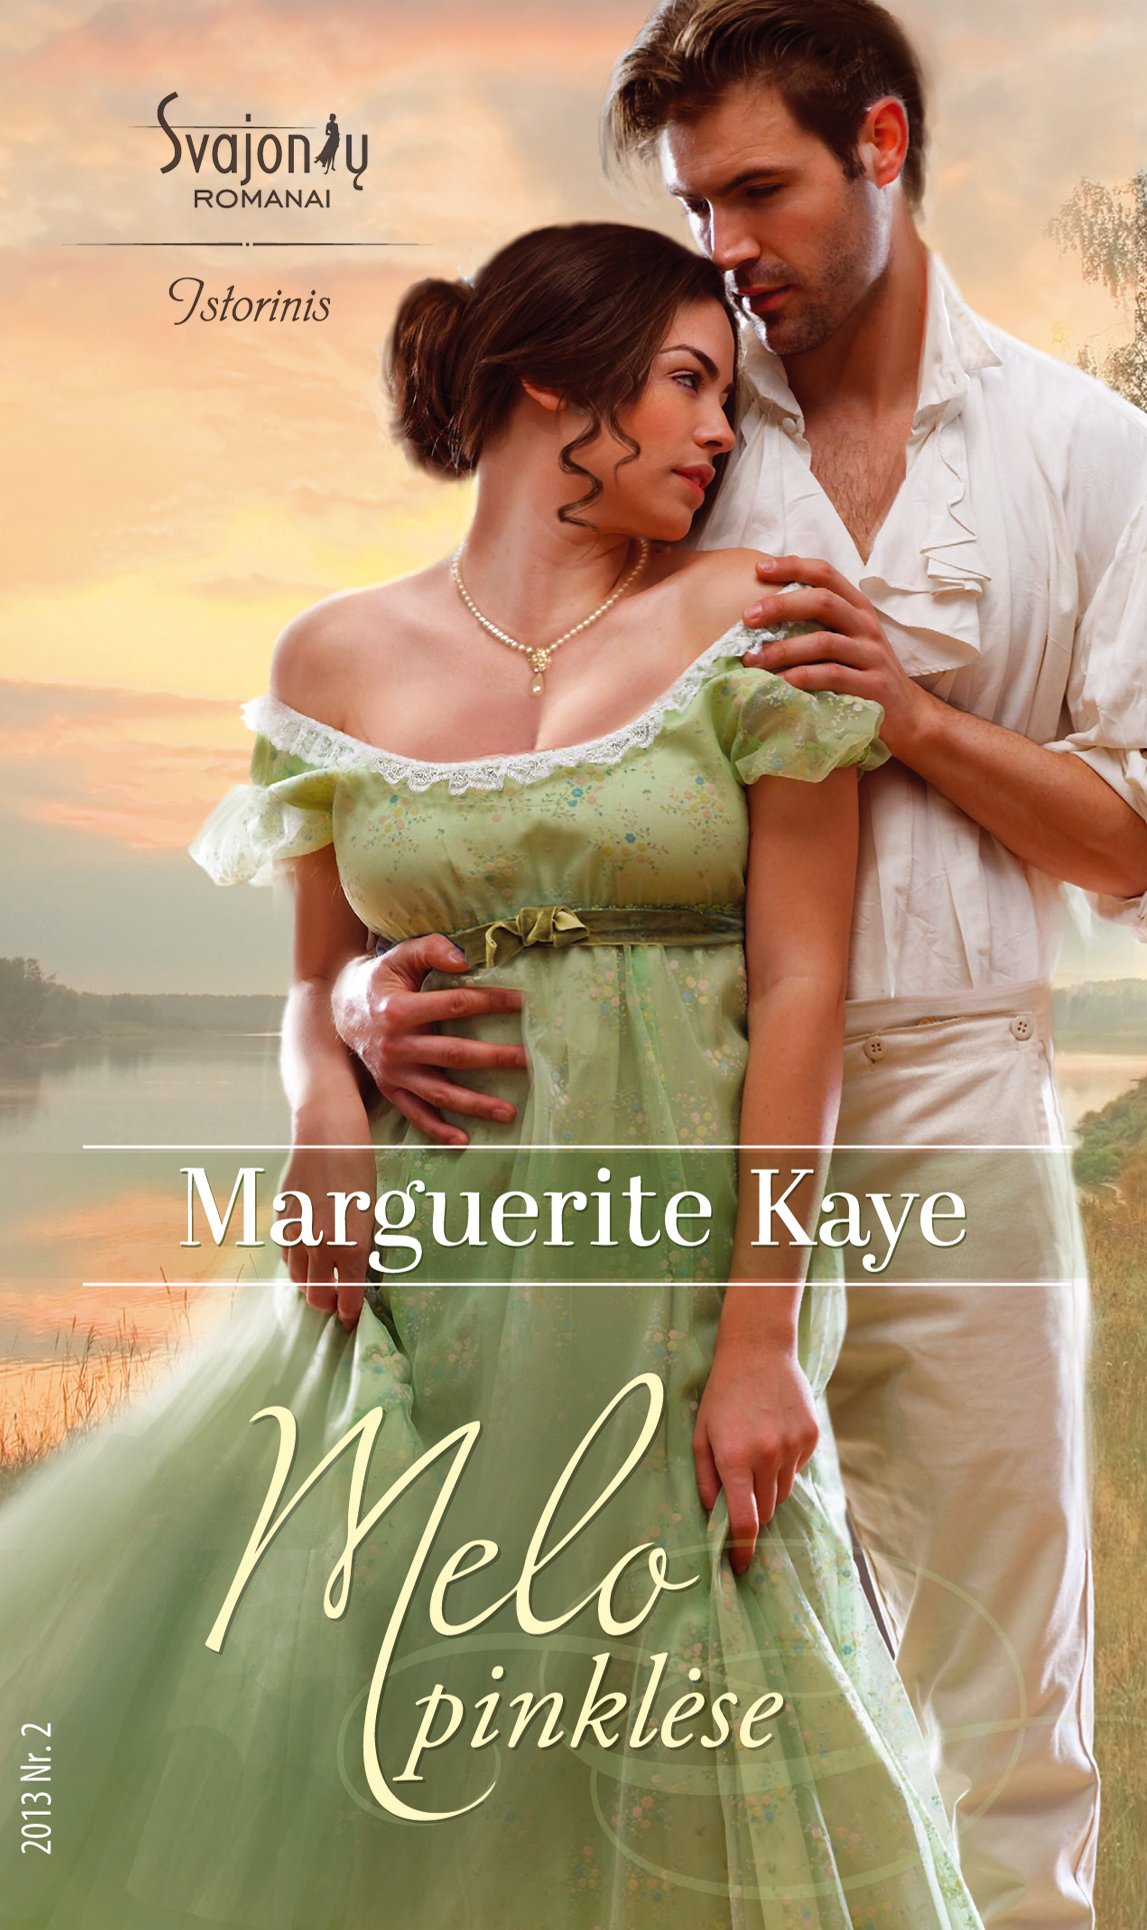 Marguerite Kaye Melo pinklėse marguerite kaye niekada nepamiršk manęs